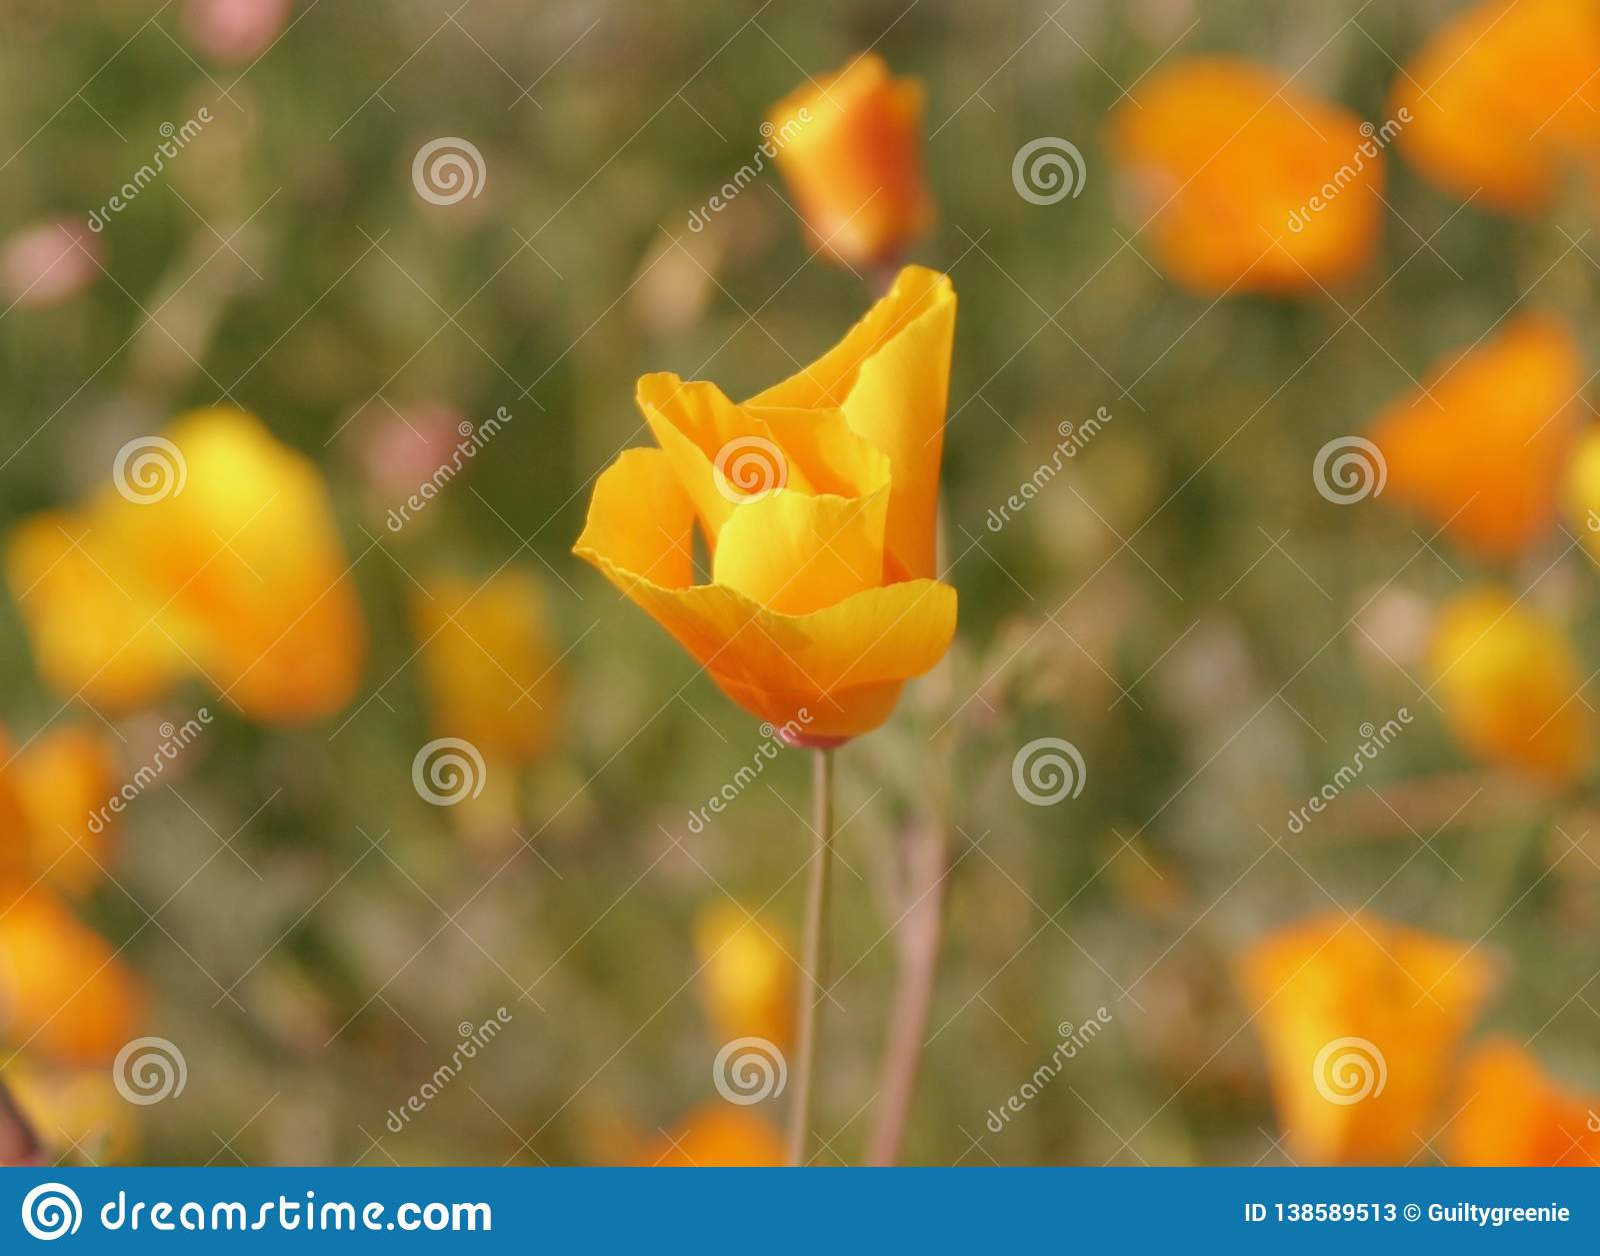 Single Curled California Poppy Flower